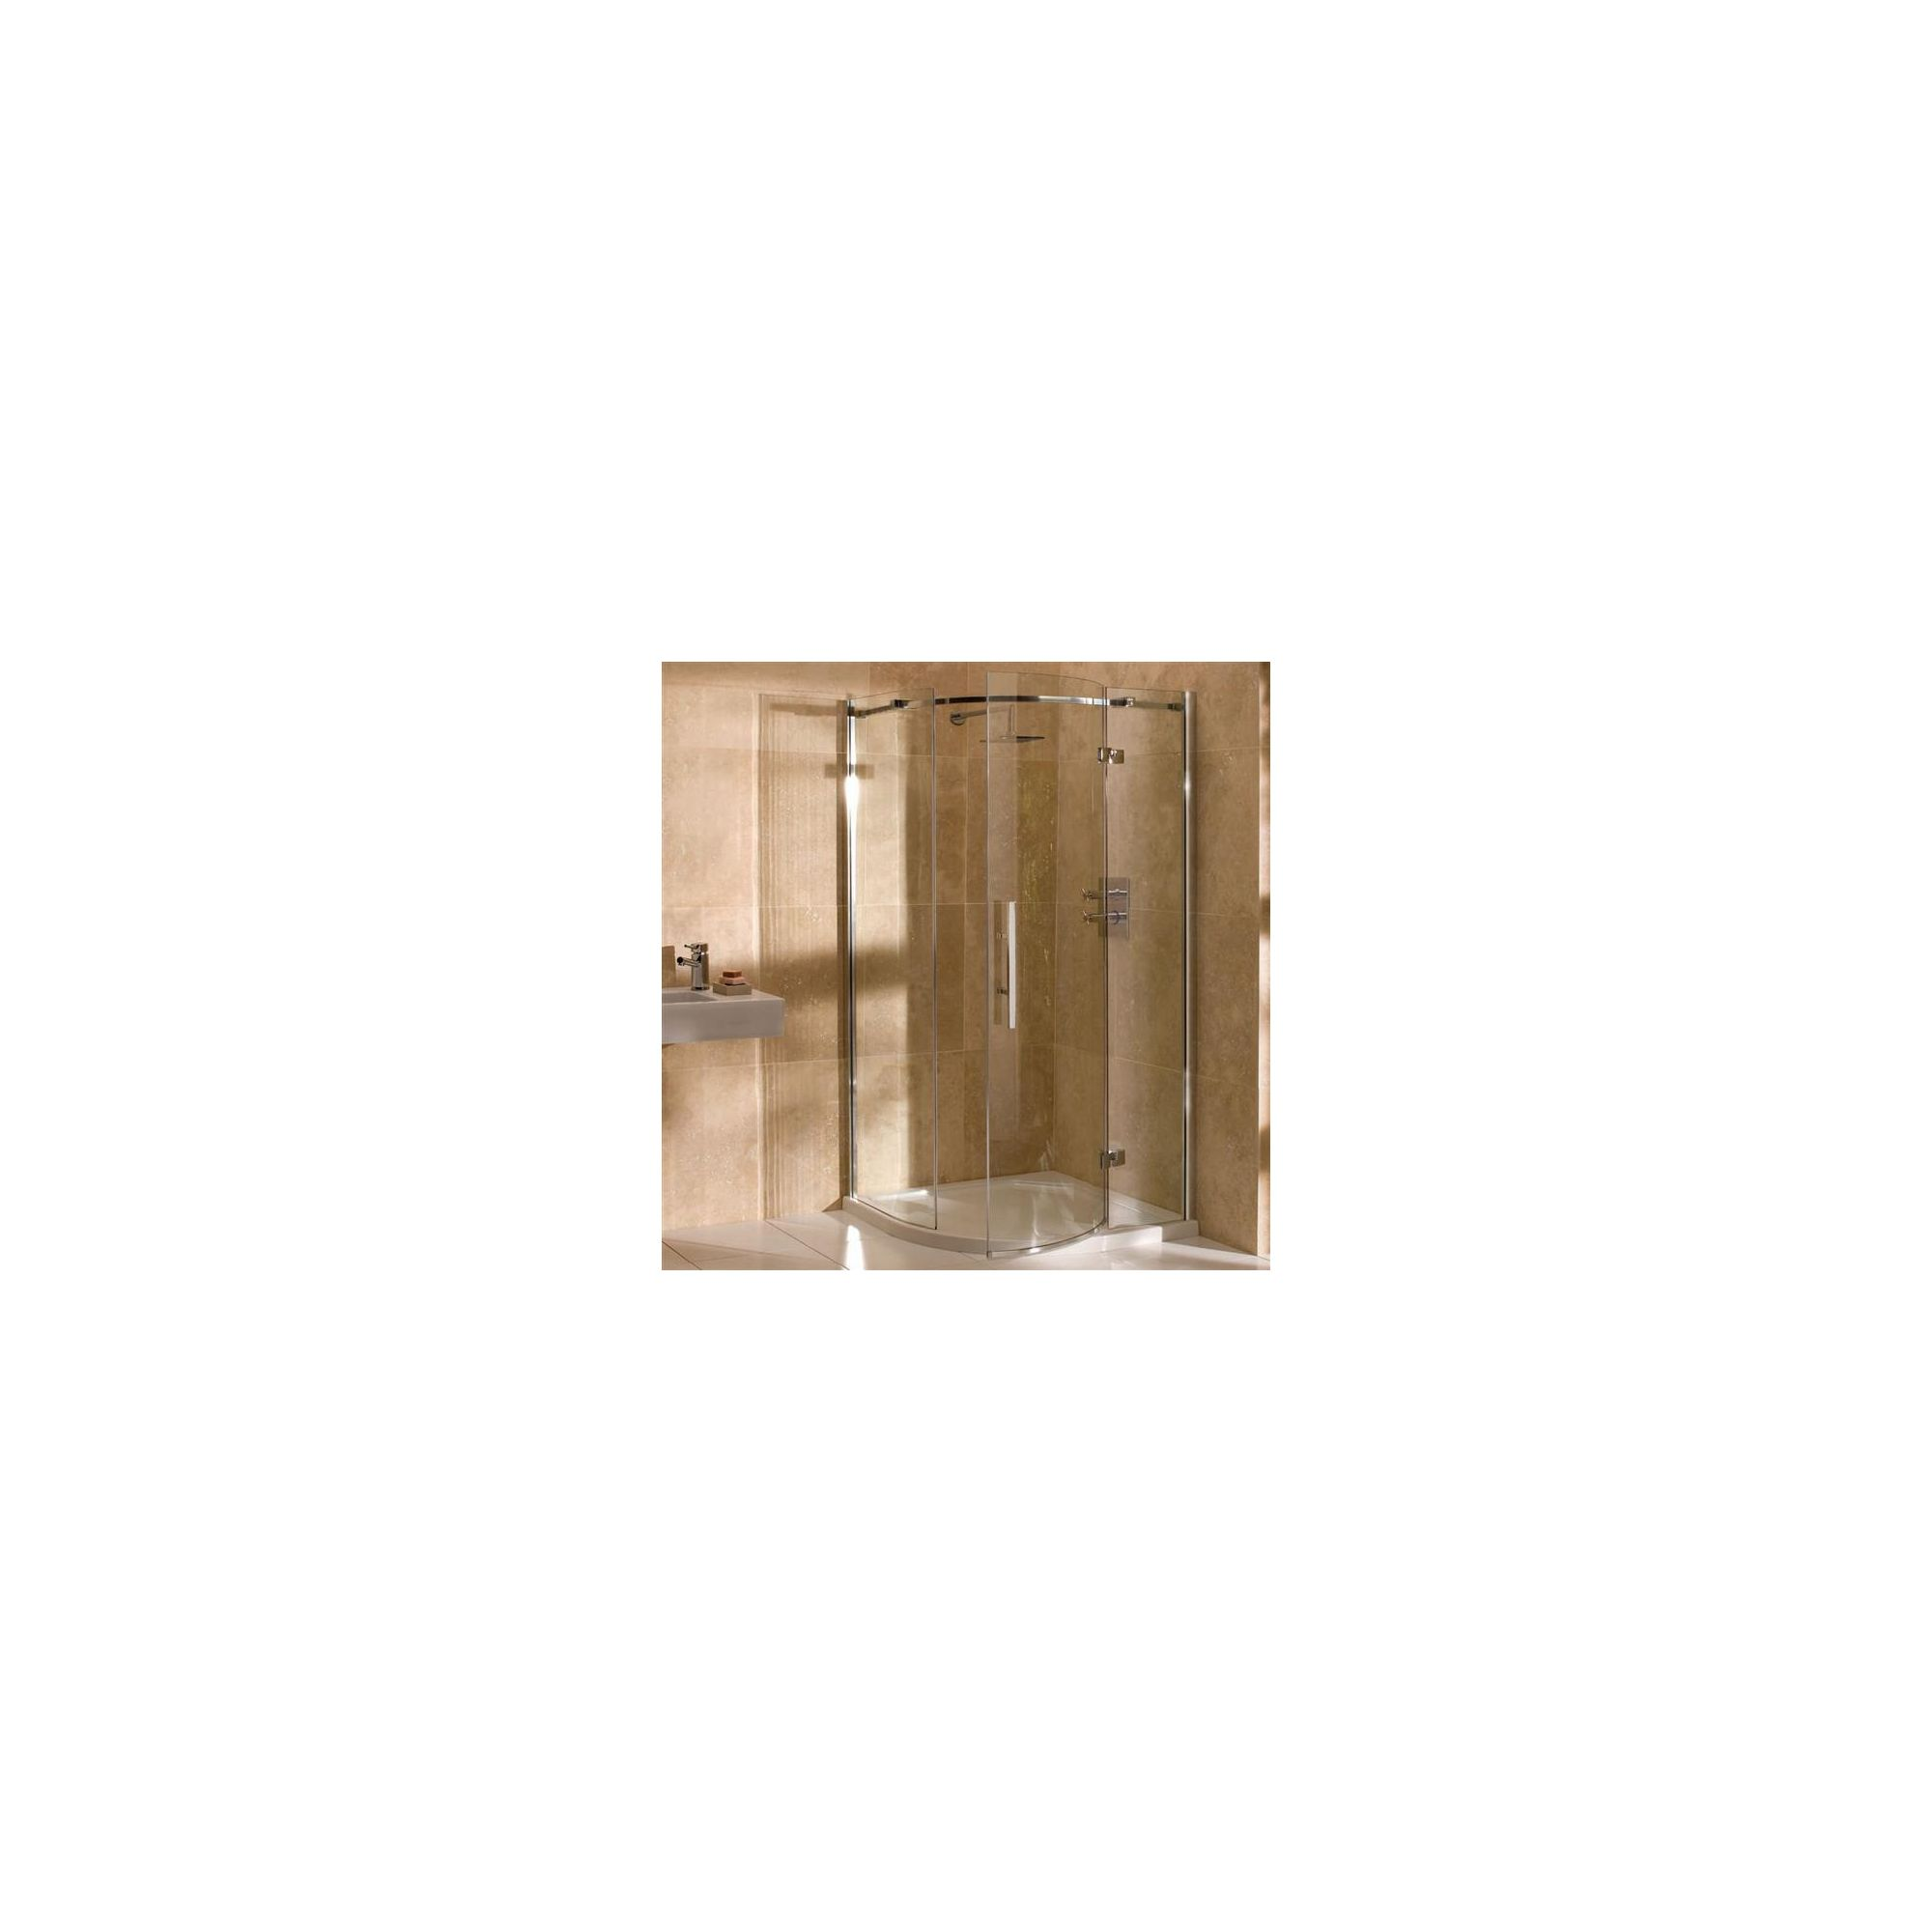 Merlyn Vivid Nine Quadrant Shower Door, 800mm x 800mm, Left Handed, 8mm Glass at Tesco Direct